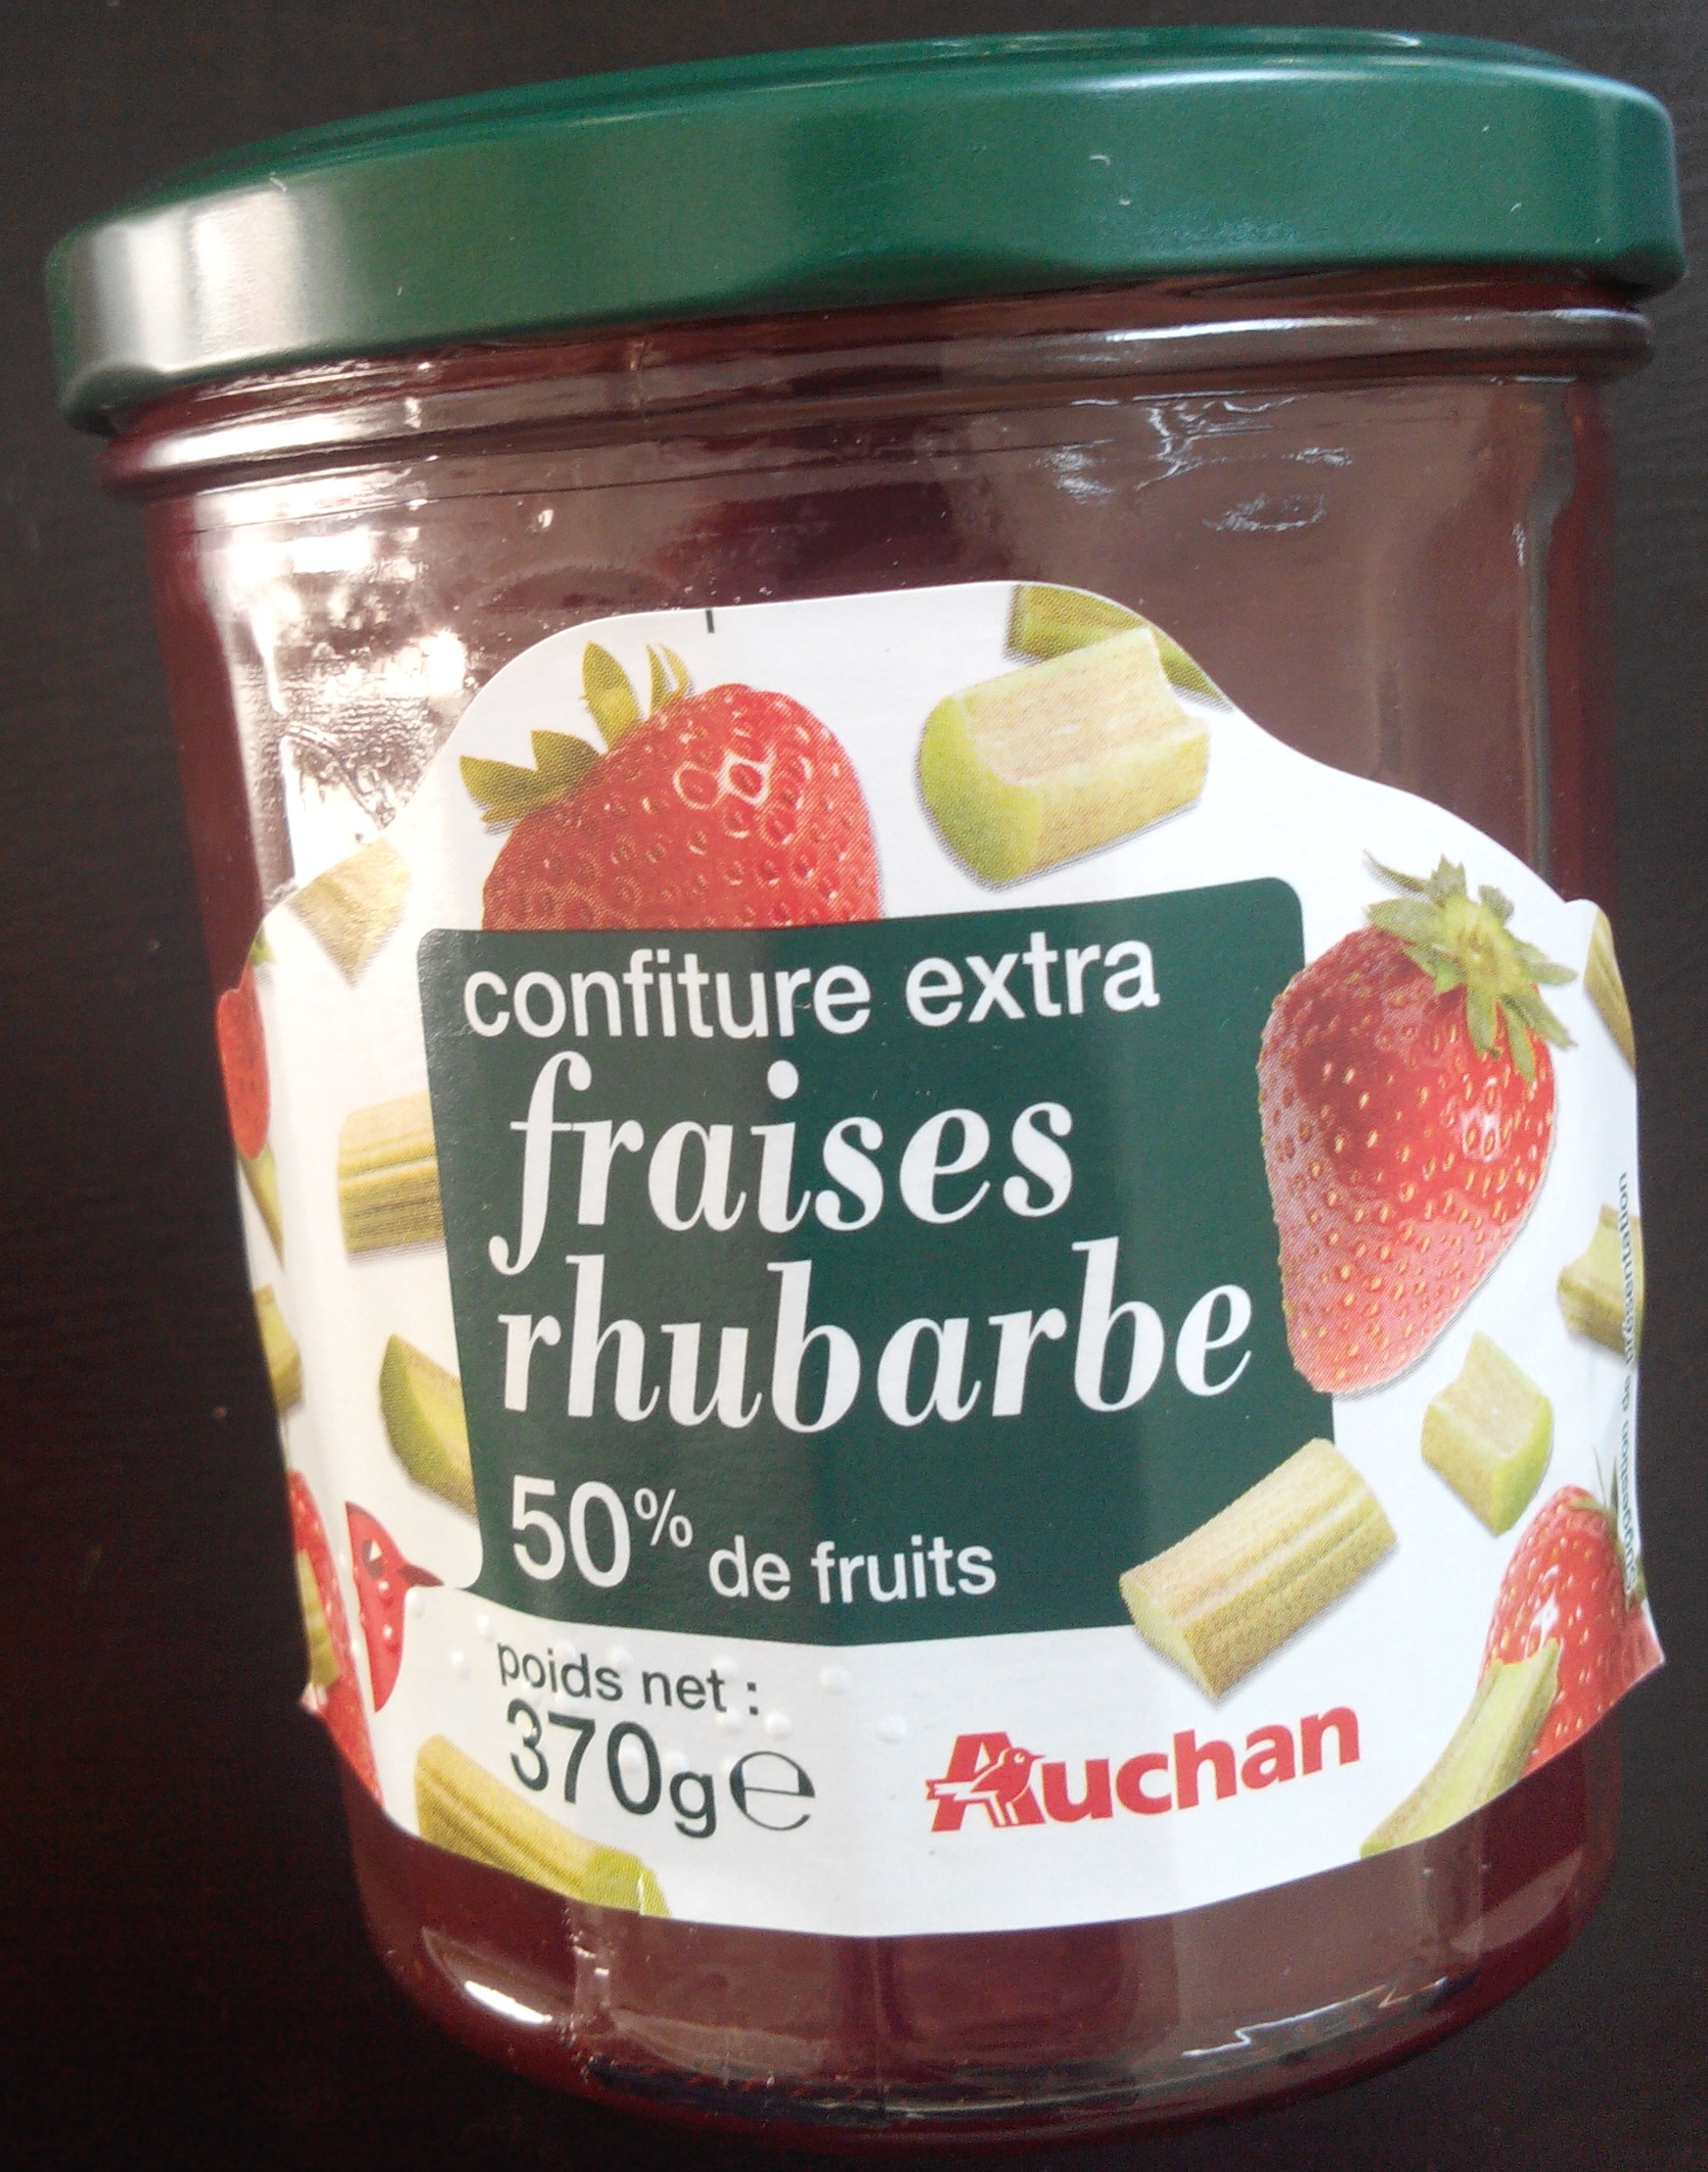 Confiture extra fraises rhubarbe - Produit